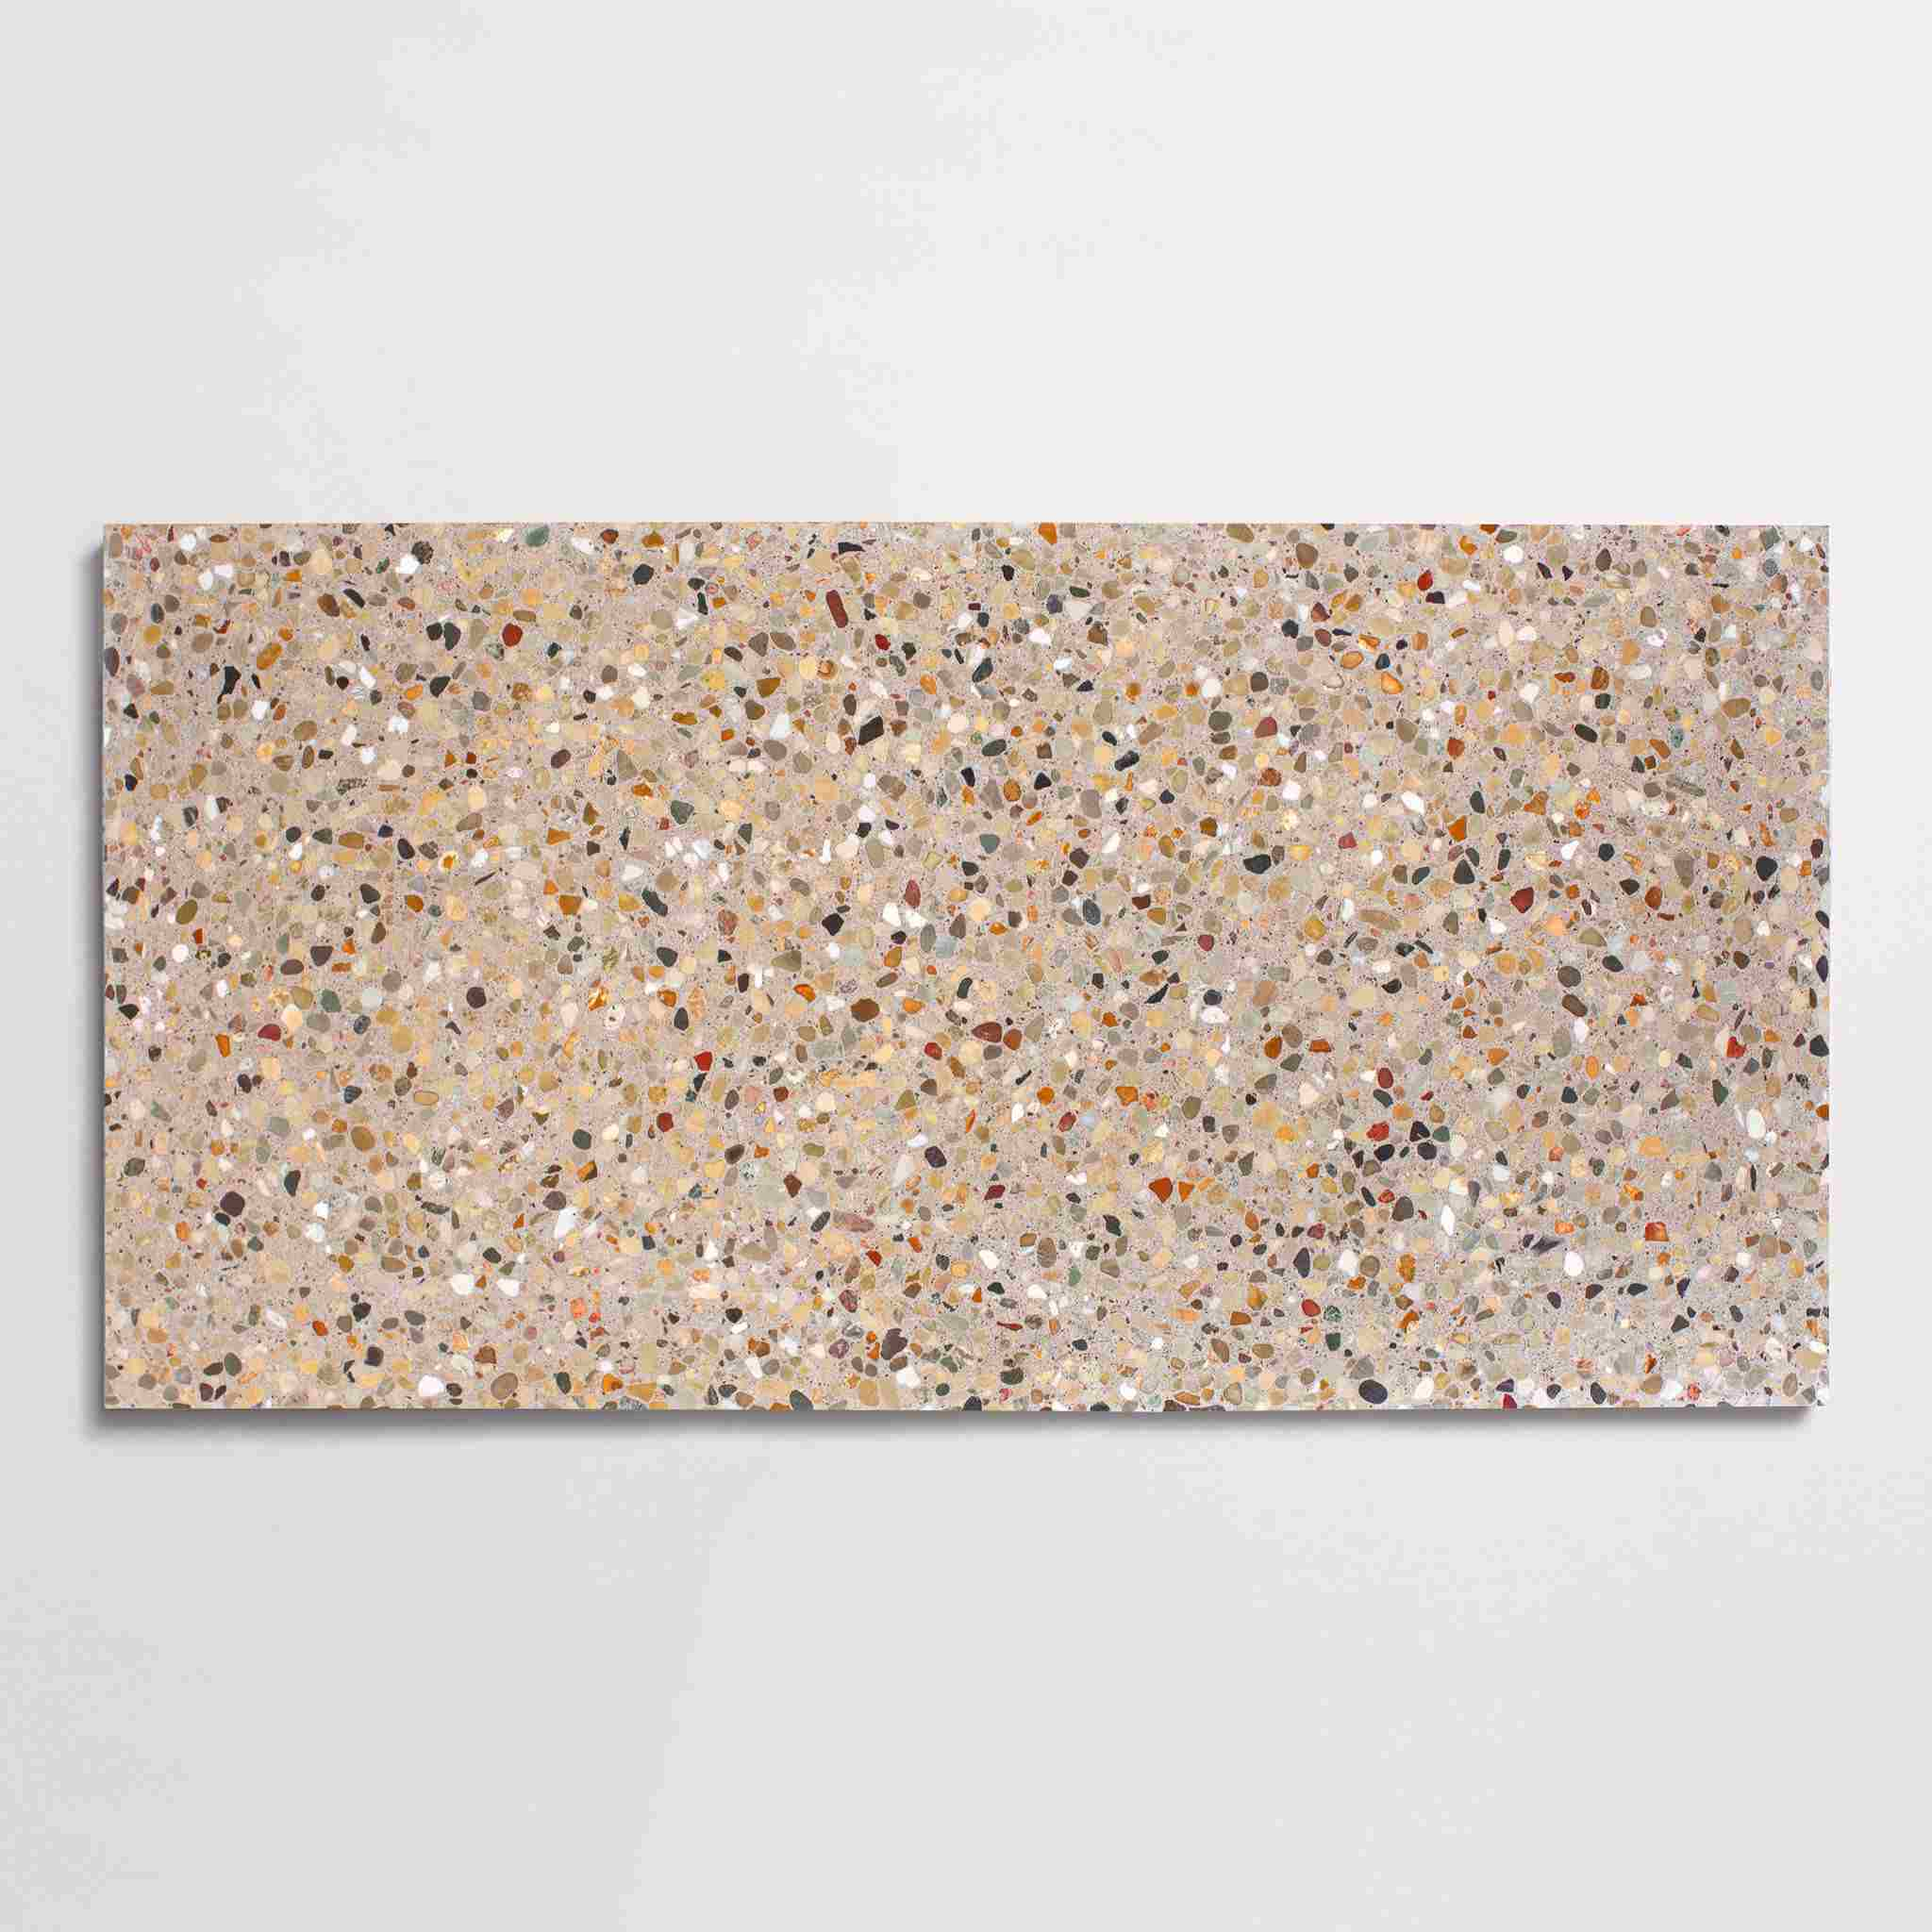 Forage—Bathroom Floor Tile Ideas